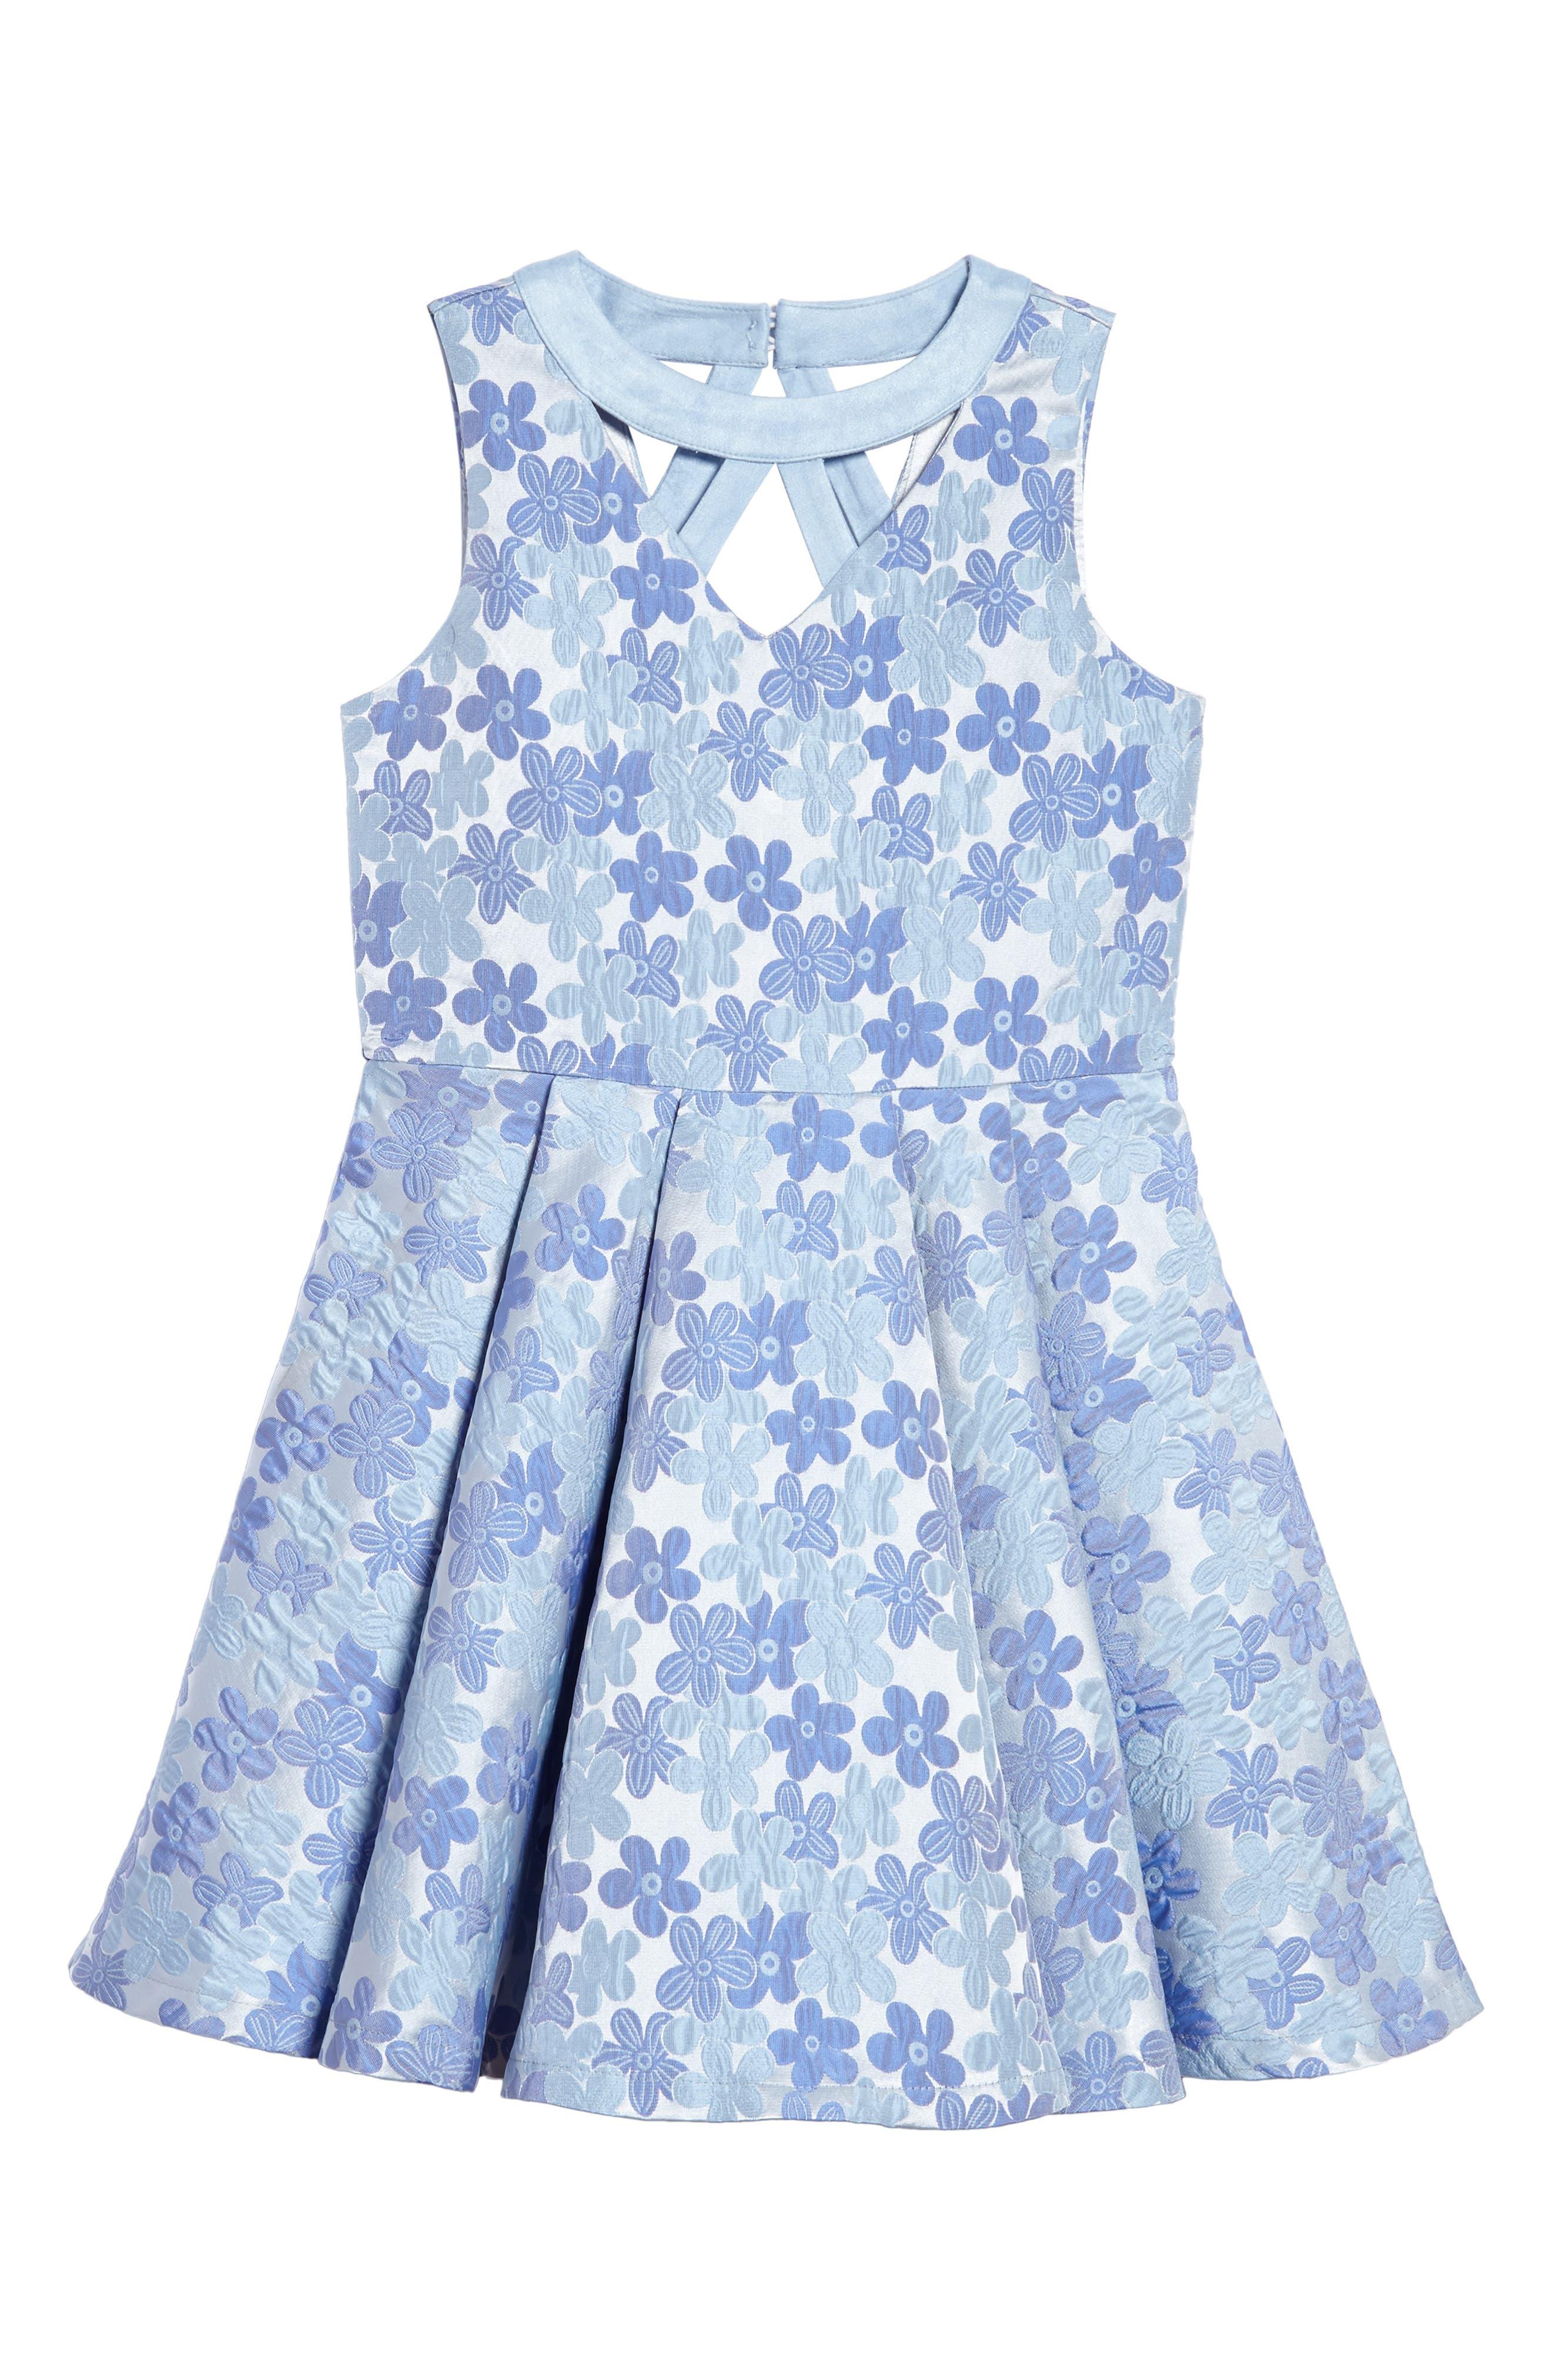 Main Image - Elisa B Daisy Brocade Fit & Flare Dress (Big Girls)